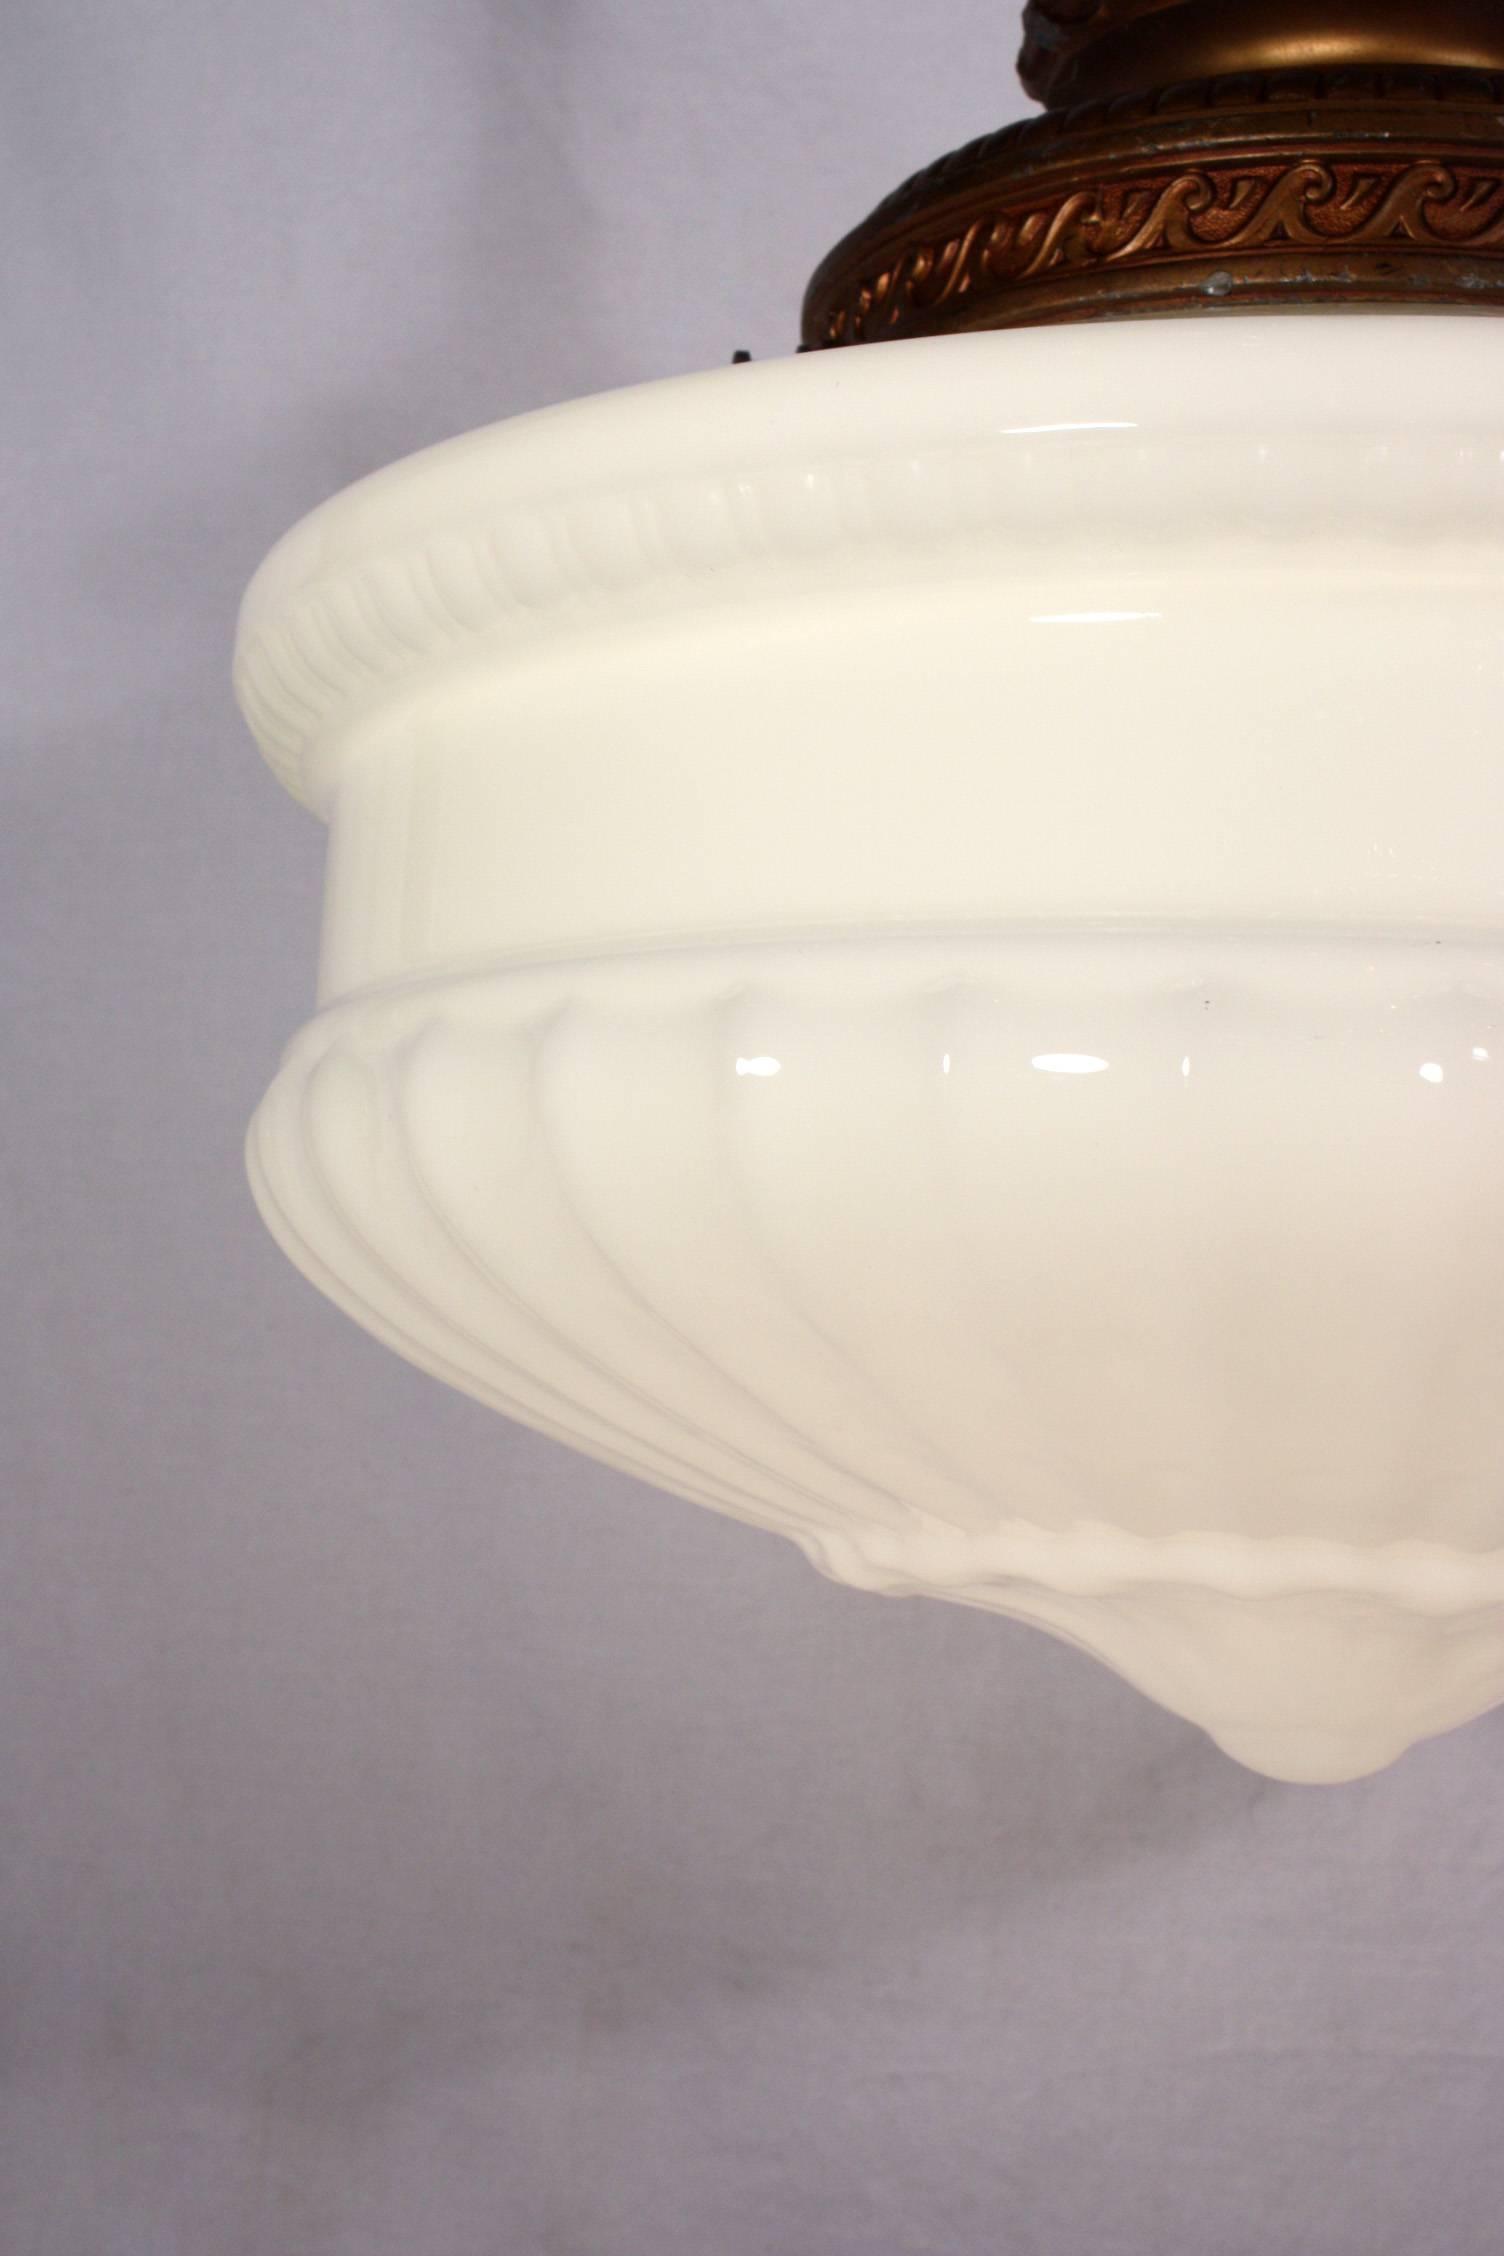 Large Antique Pendant Light Fixture With Original Milk Glass Shade regarding Milk Glass Pendant Light Fixtures (Image 5 of 15)